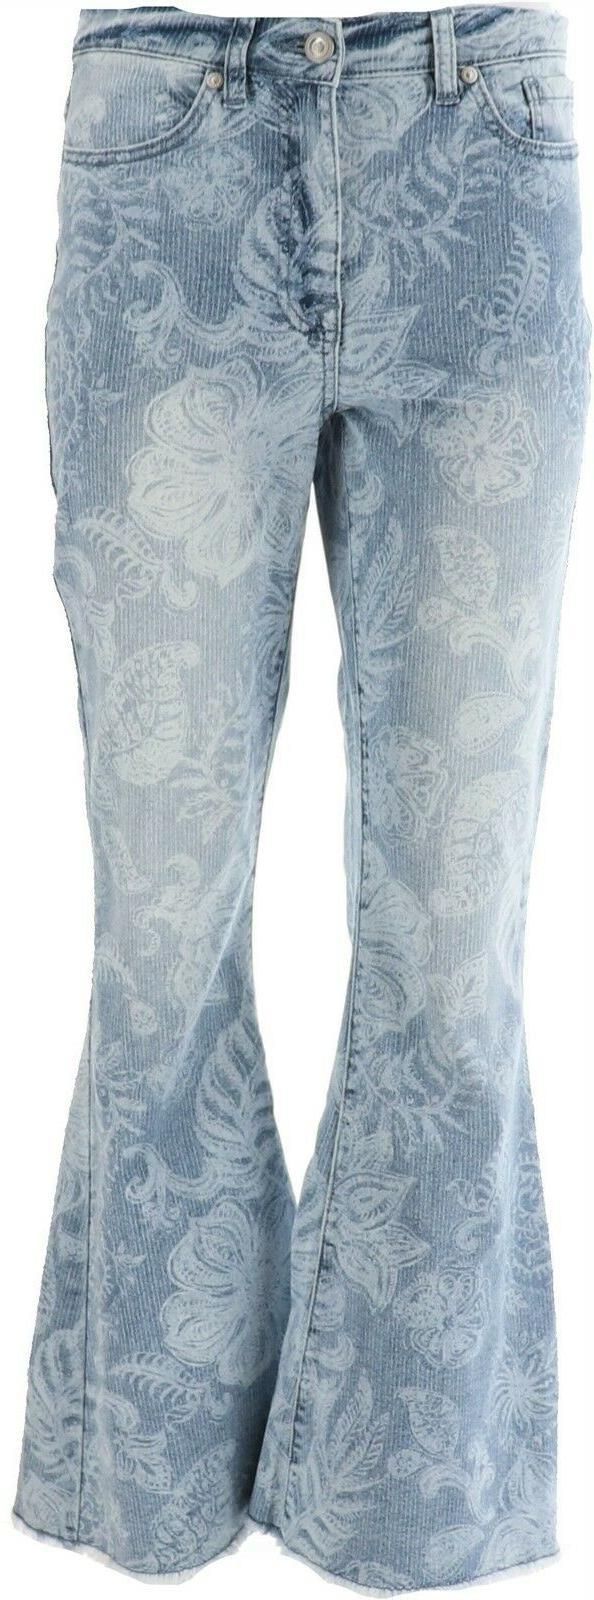 dg2 diane gilman stretch printed flare jean